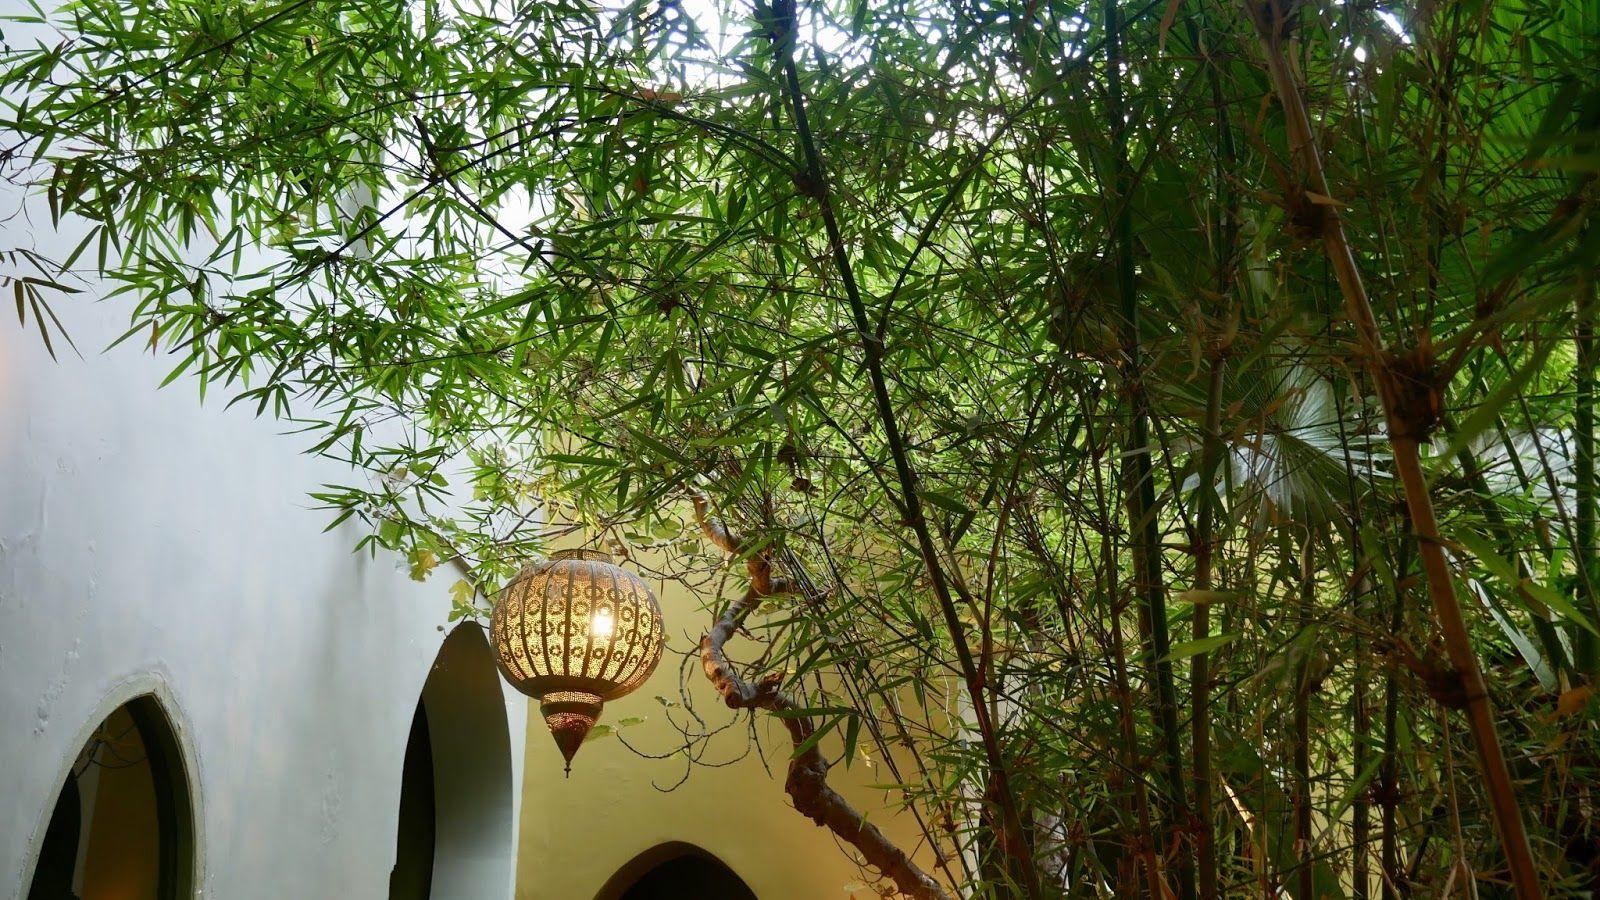 Lampion Restaurant Le Jardin Marrakech Médina | Lugares En ... concernant Lampion Jardin